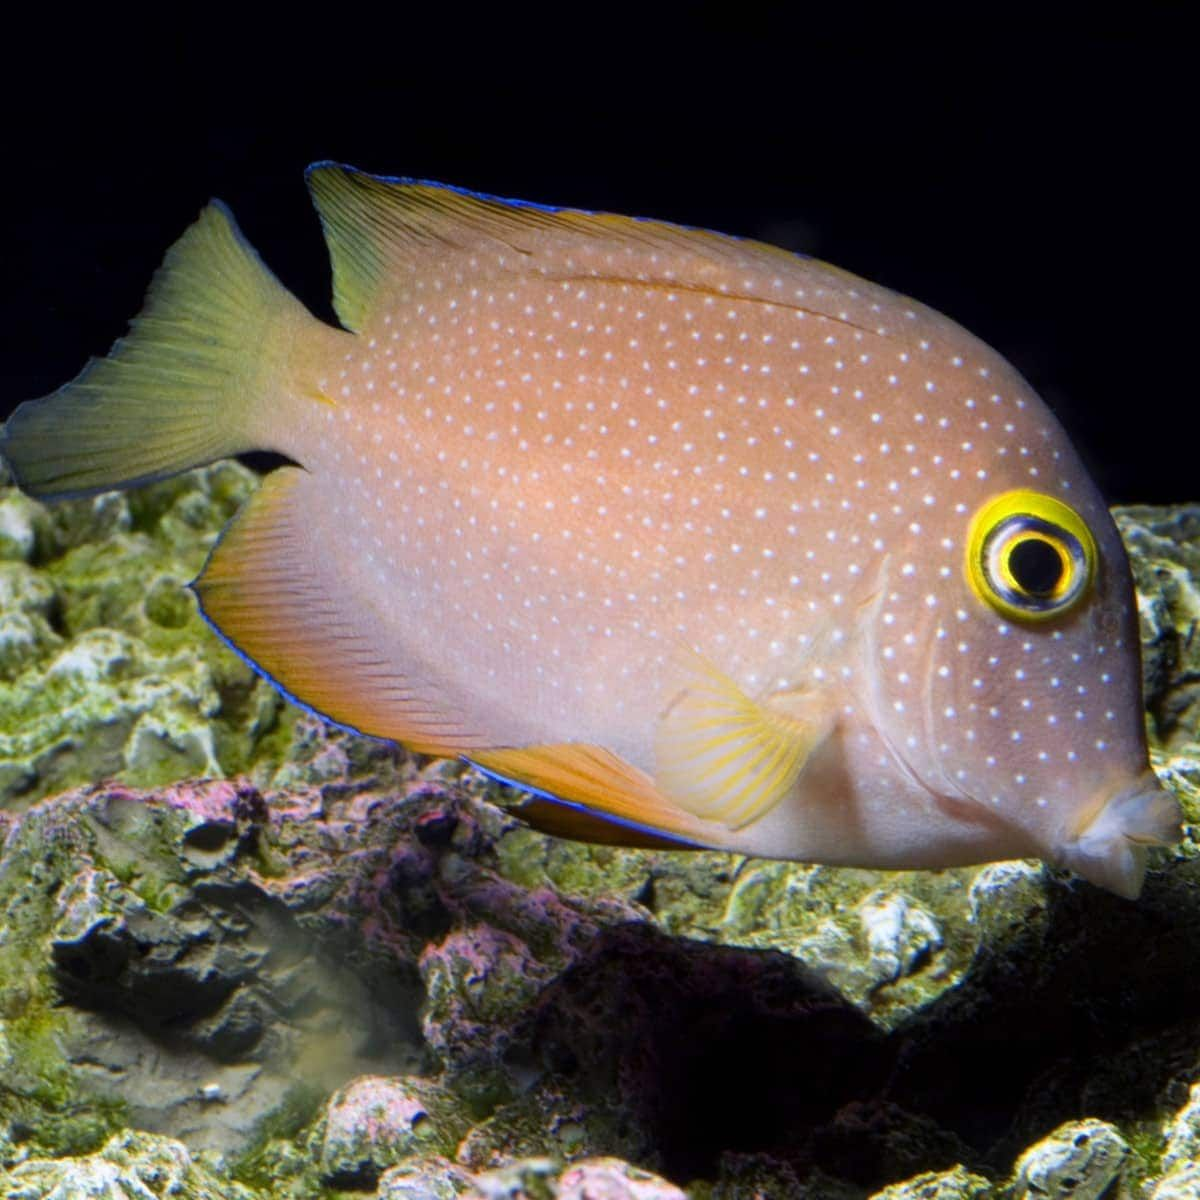 45 99 Spotted Yellow Eye Tang Ctenochaetus Truncatus Care Minimum Tank Size 70 Gallons Care Level Intermediate Temperament Semi A Yellow Eyes Fish Pet Tang